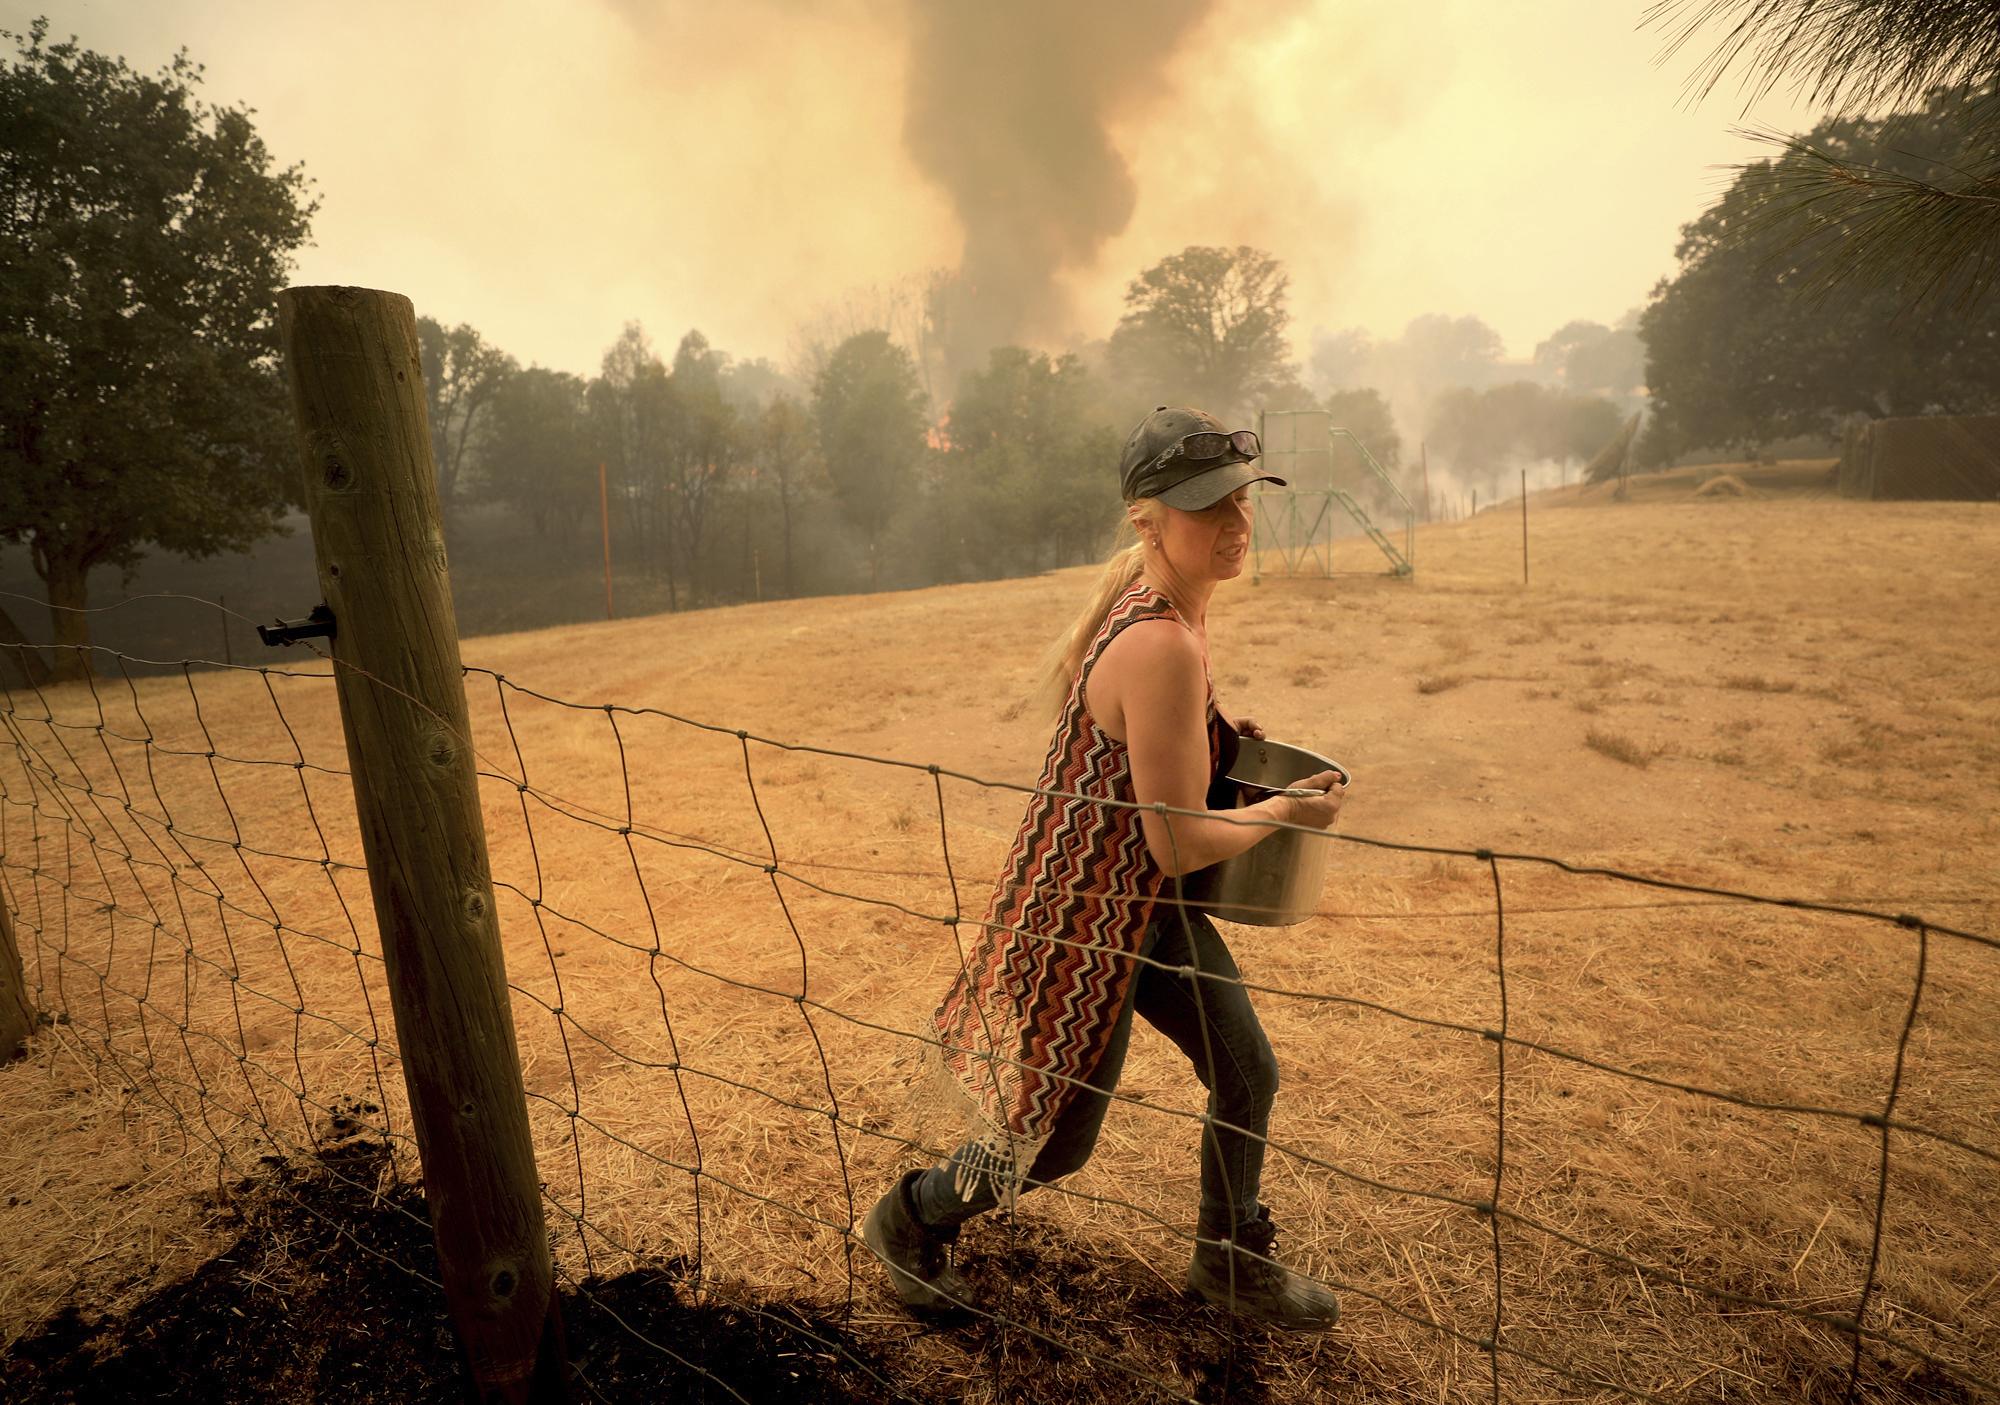 California_Wildfires_50764-159532.jpg89203559